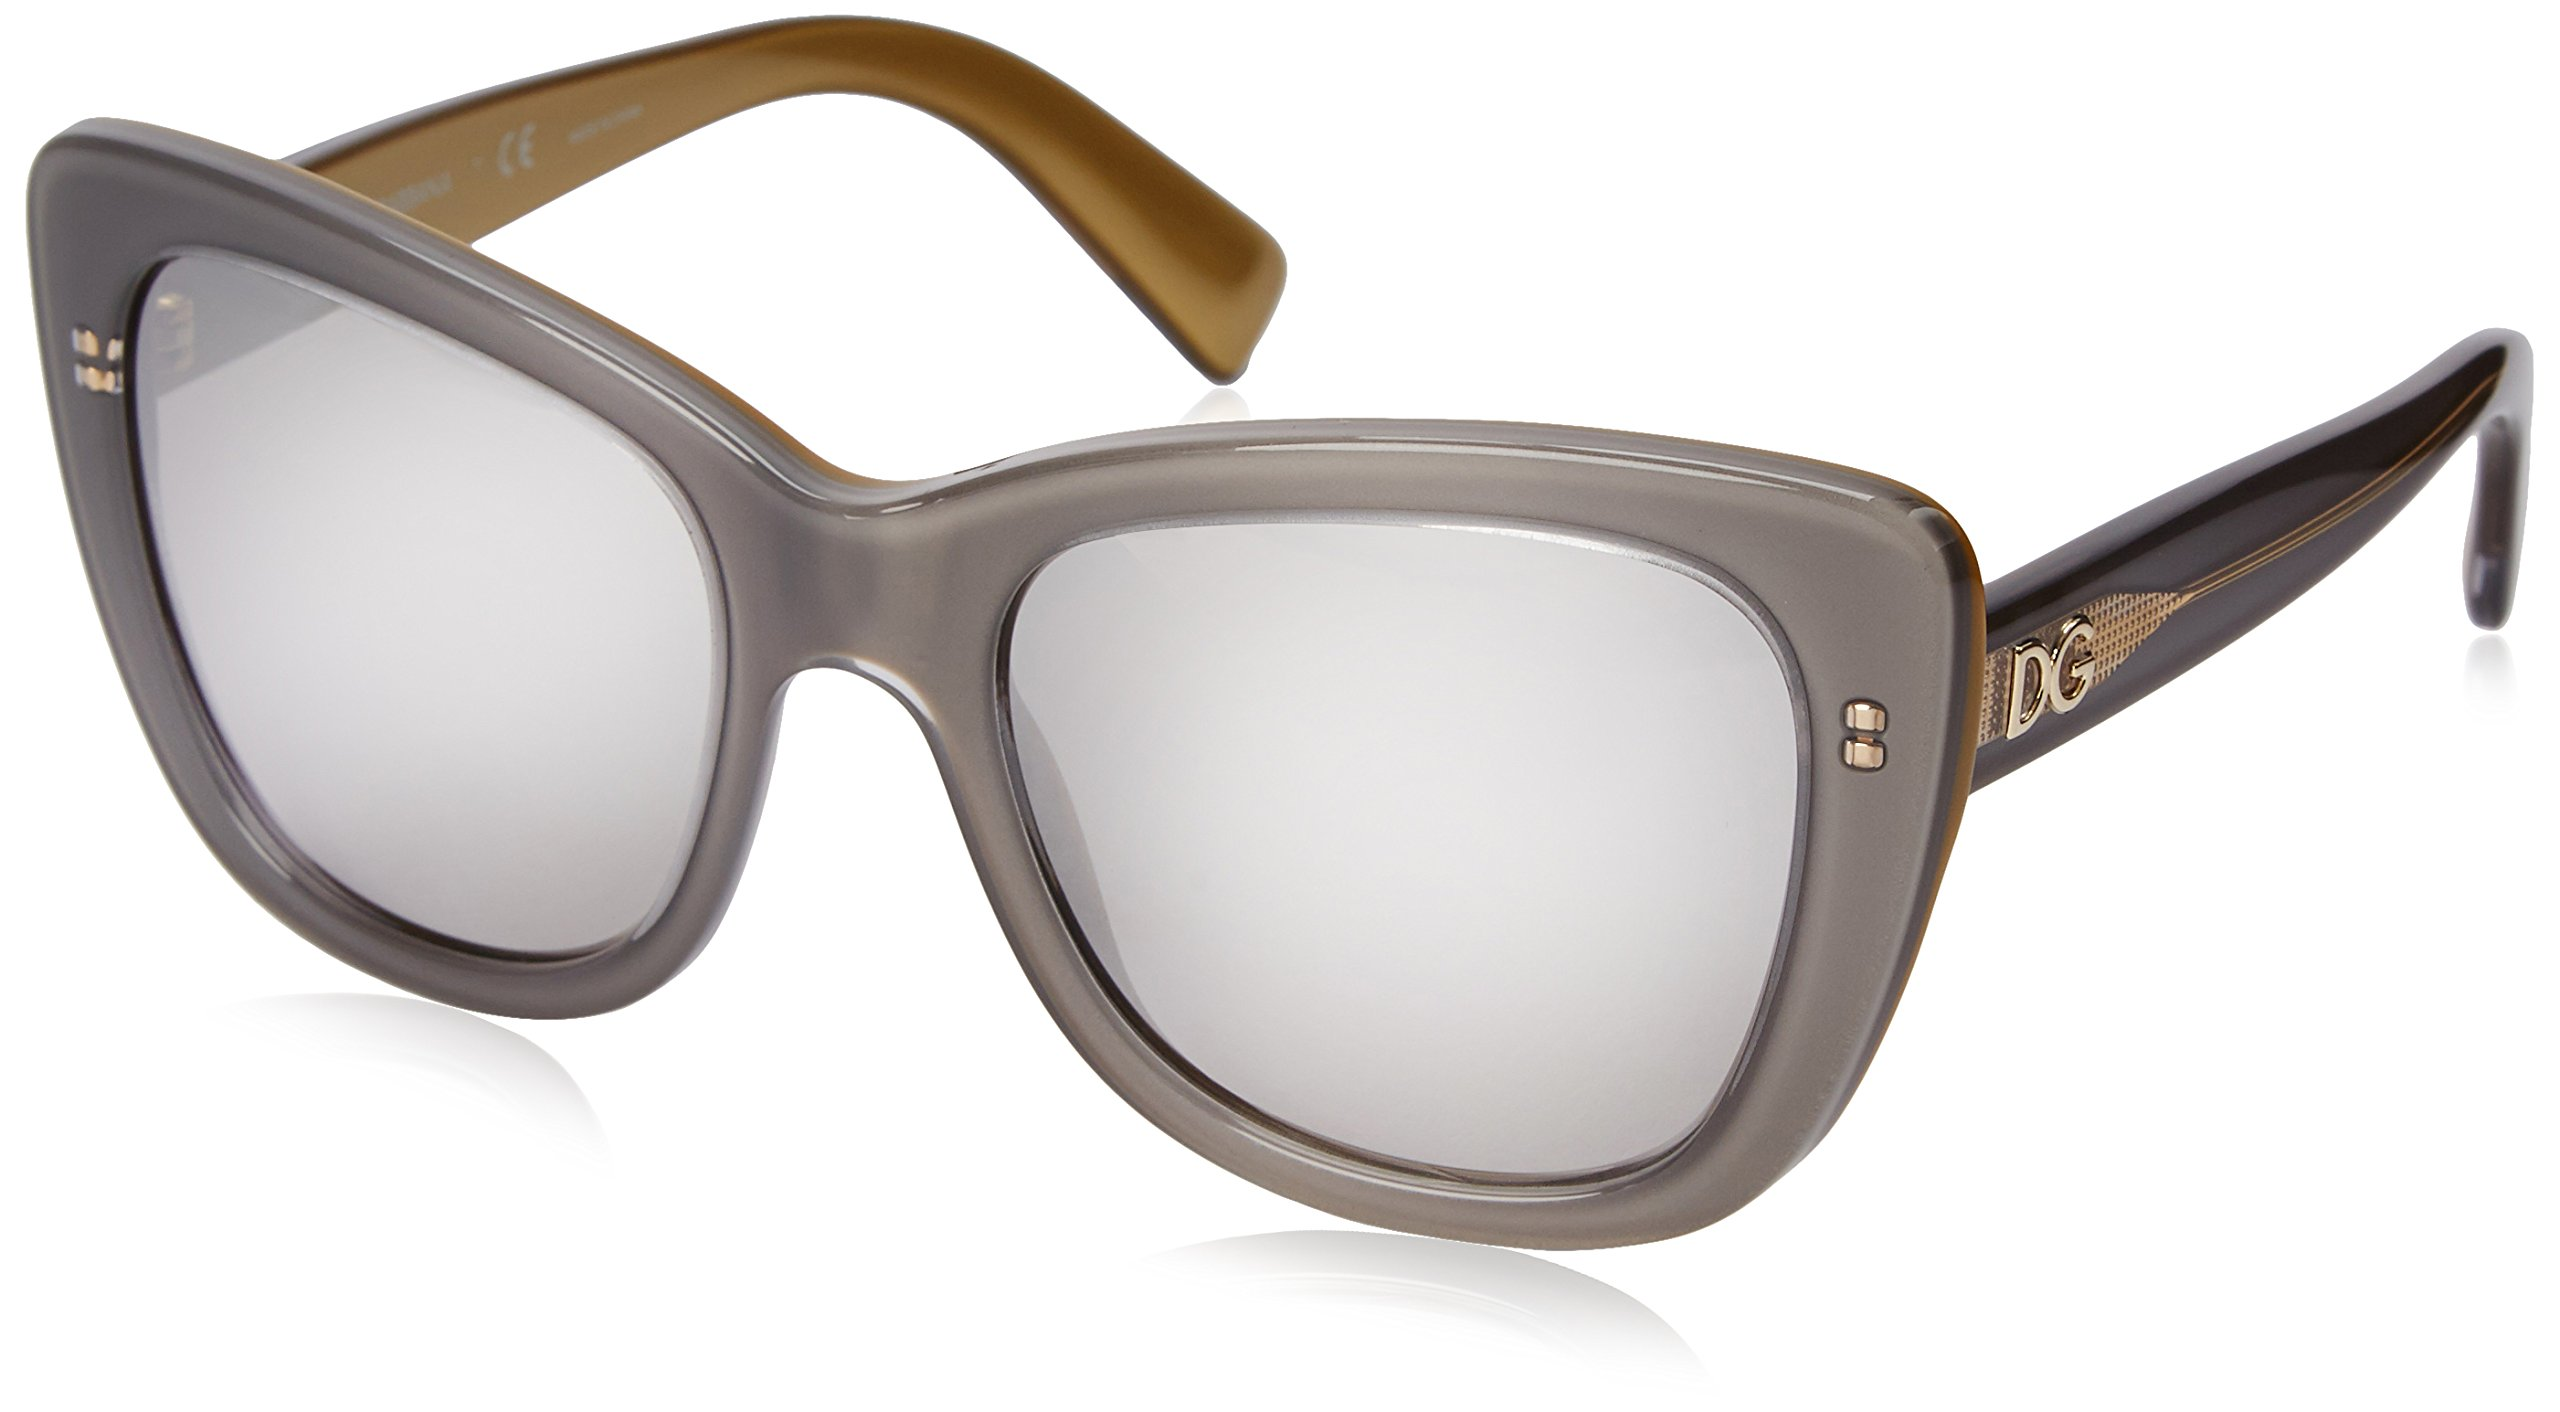 D&G Dolce & Gabbana Womens 0DG4260 Cateye Sunglasses, Top Grey On Gold, 50 mm